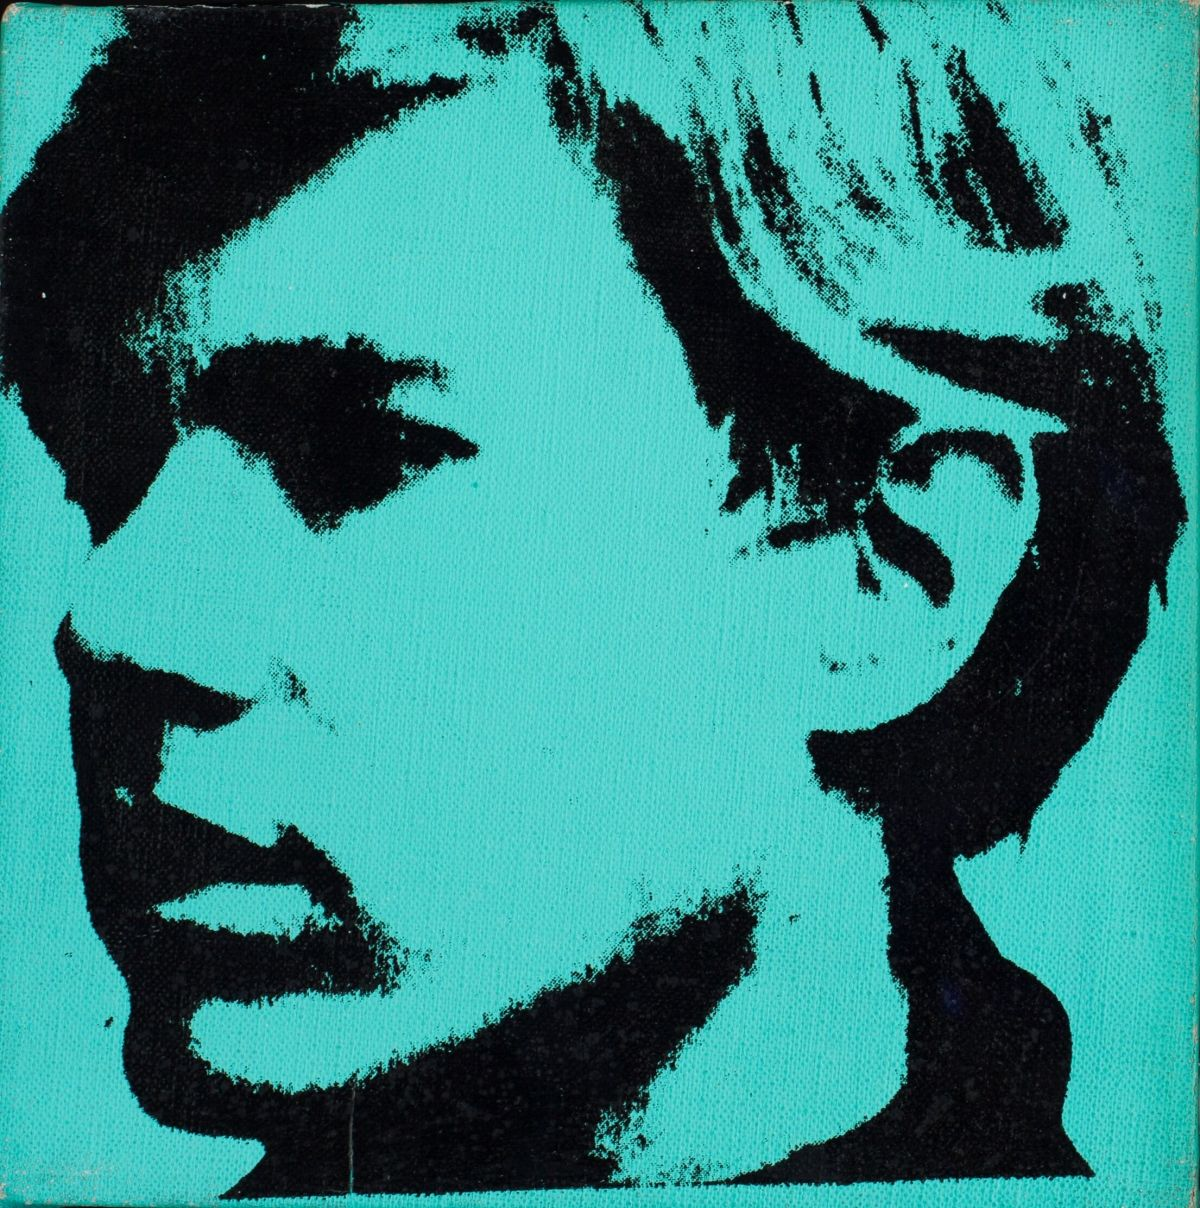 Andy Warhol work